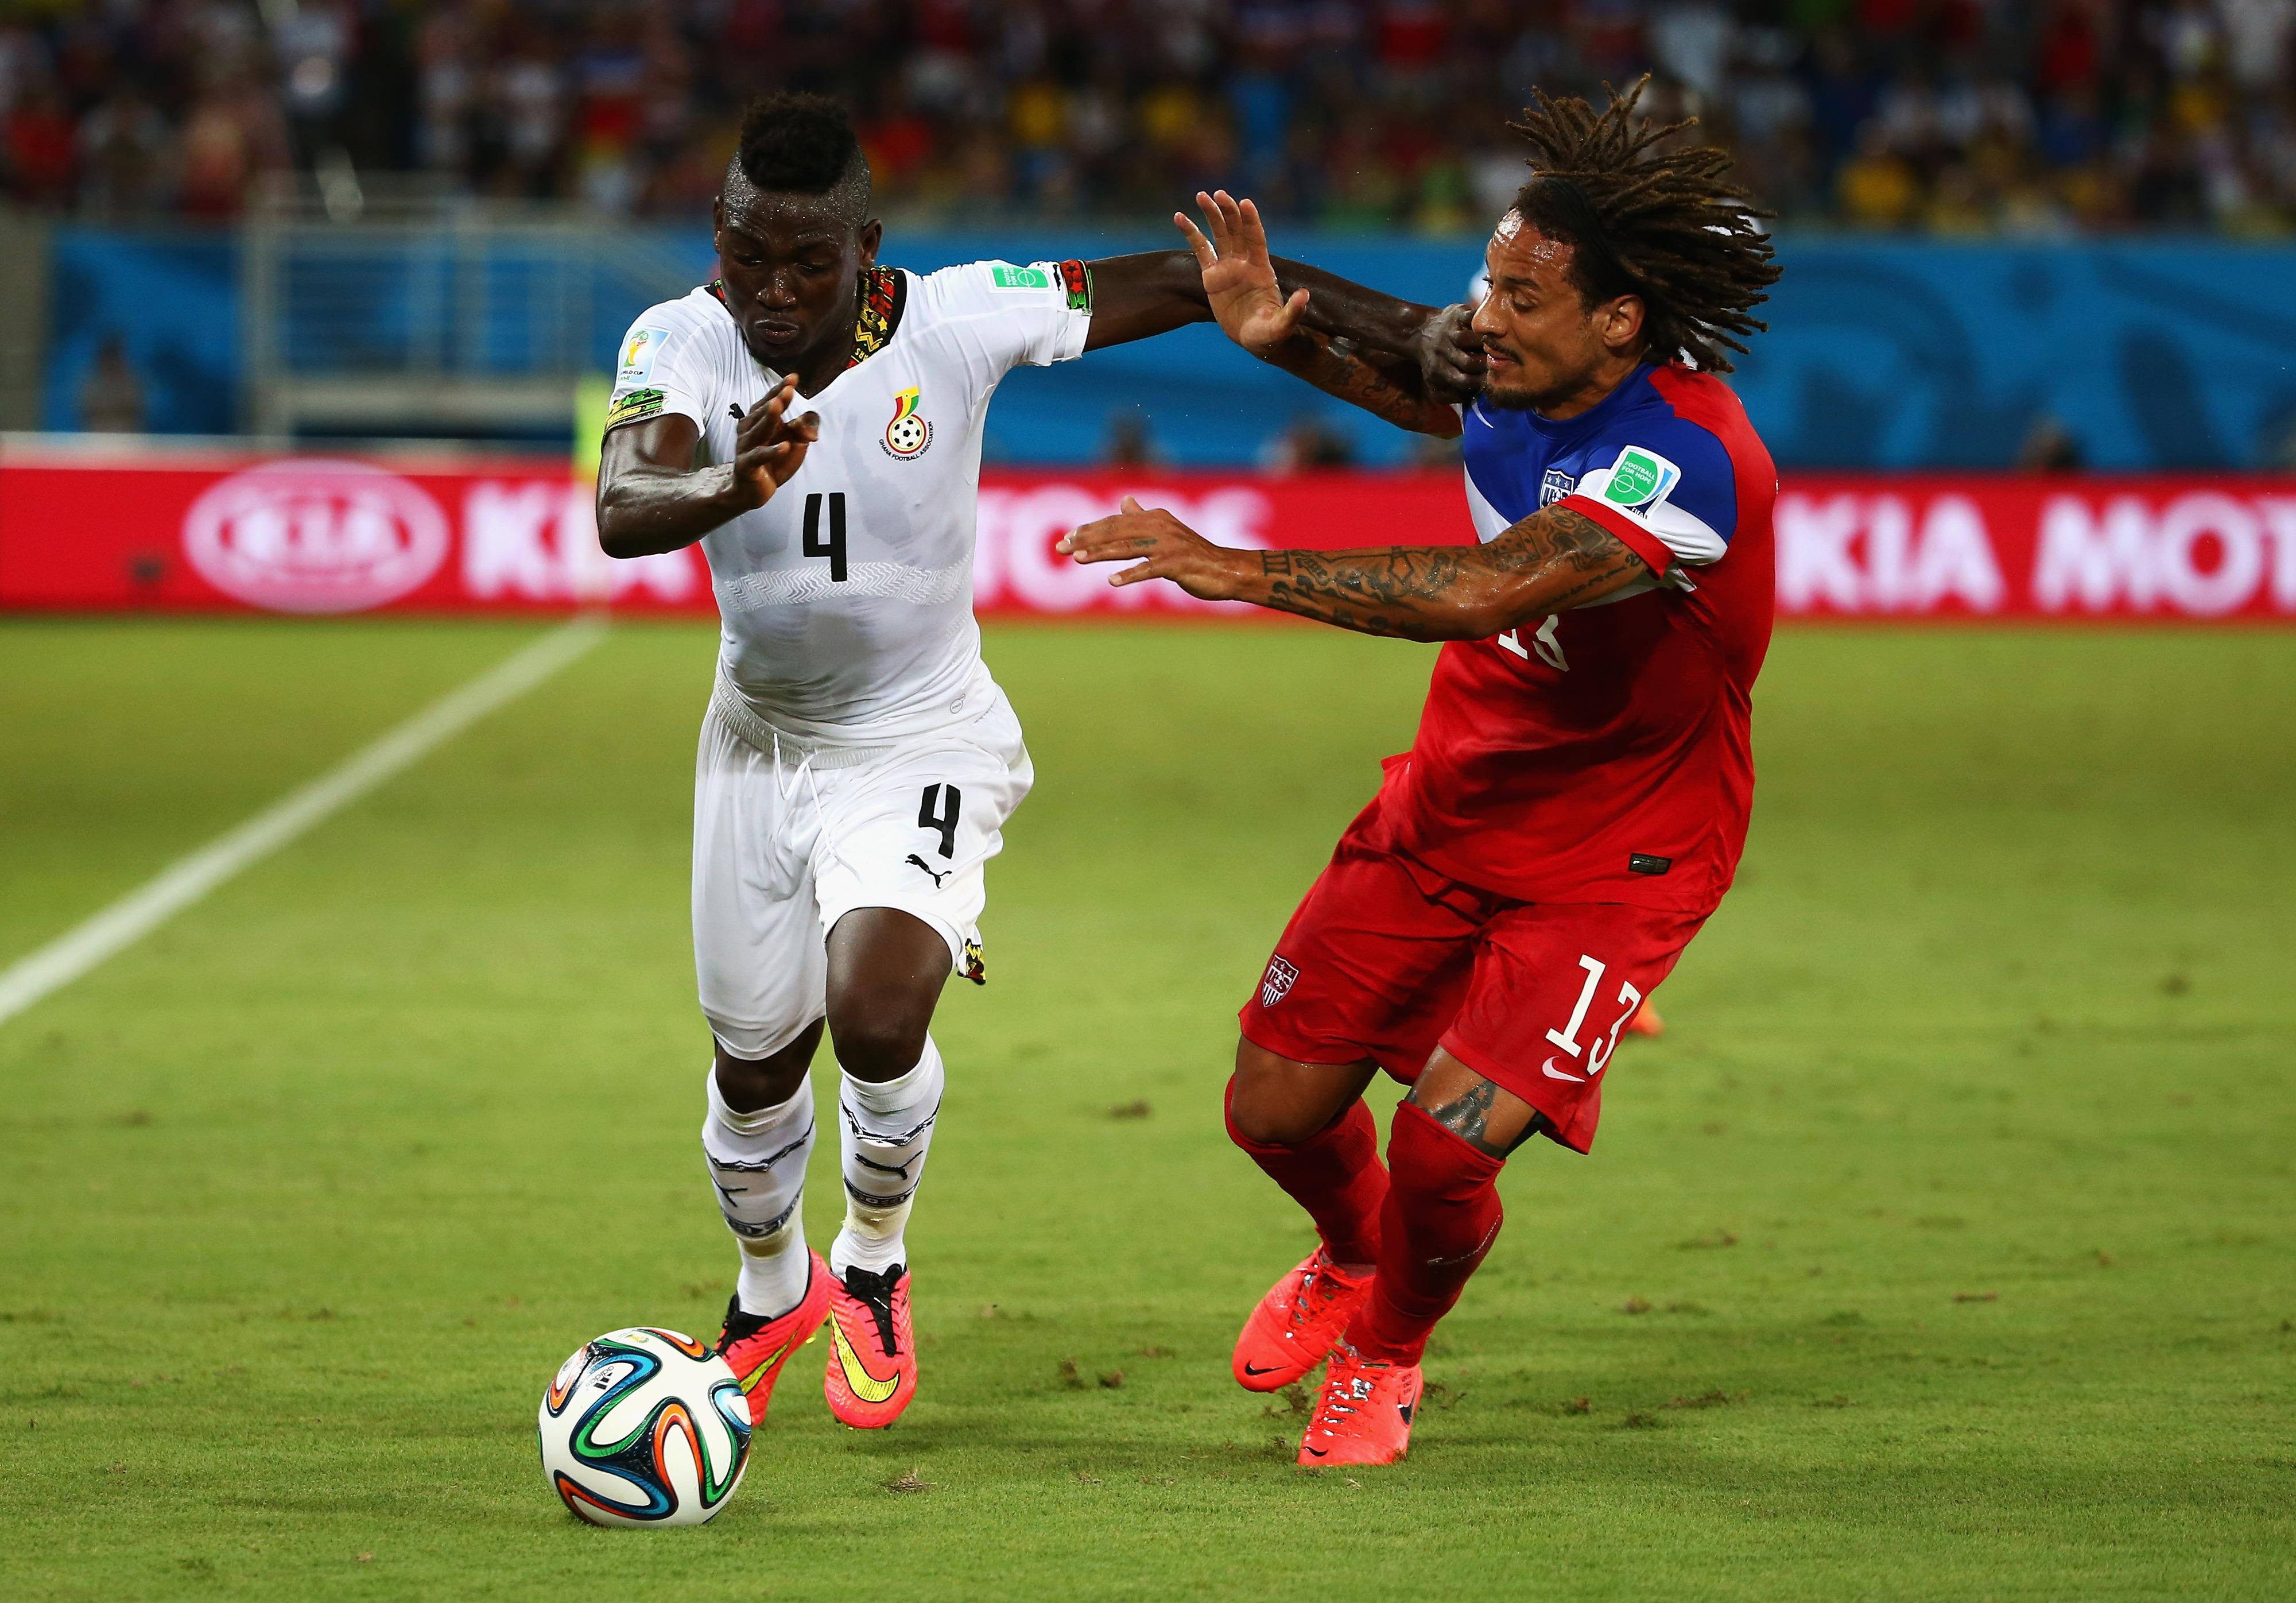 USA vs. Ghana analysis: Jermaine Jones the USMNT's unlikely superstar